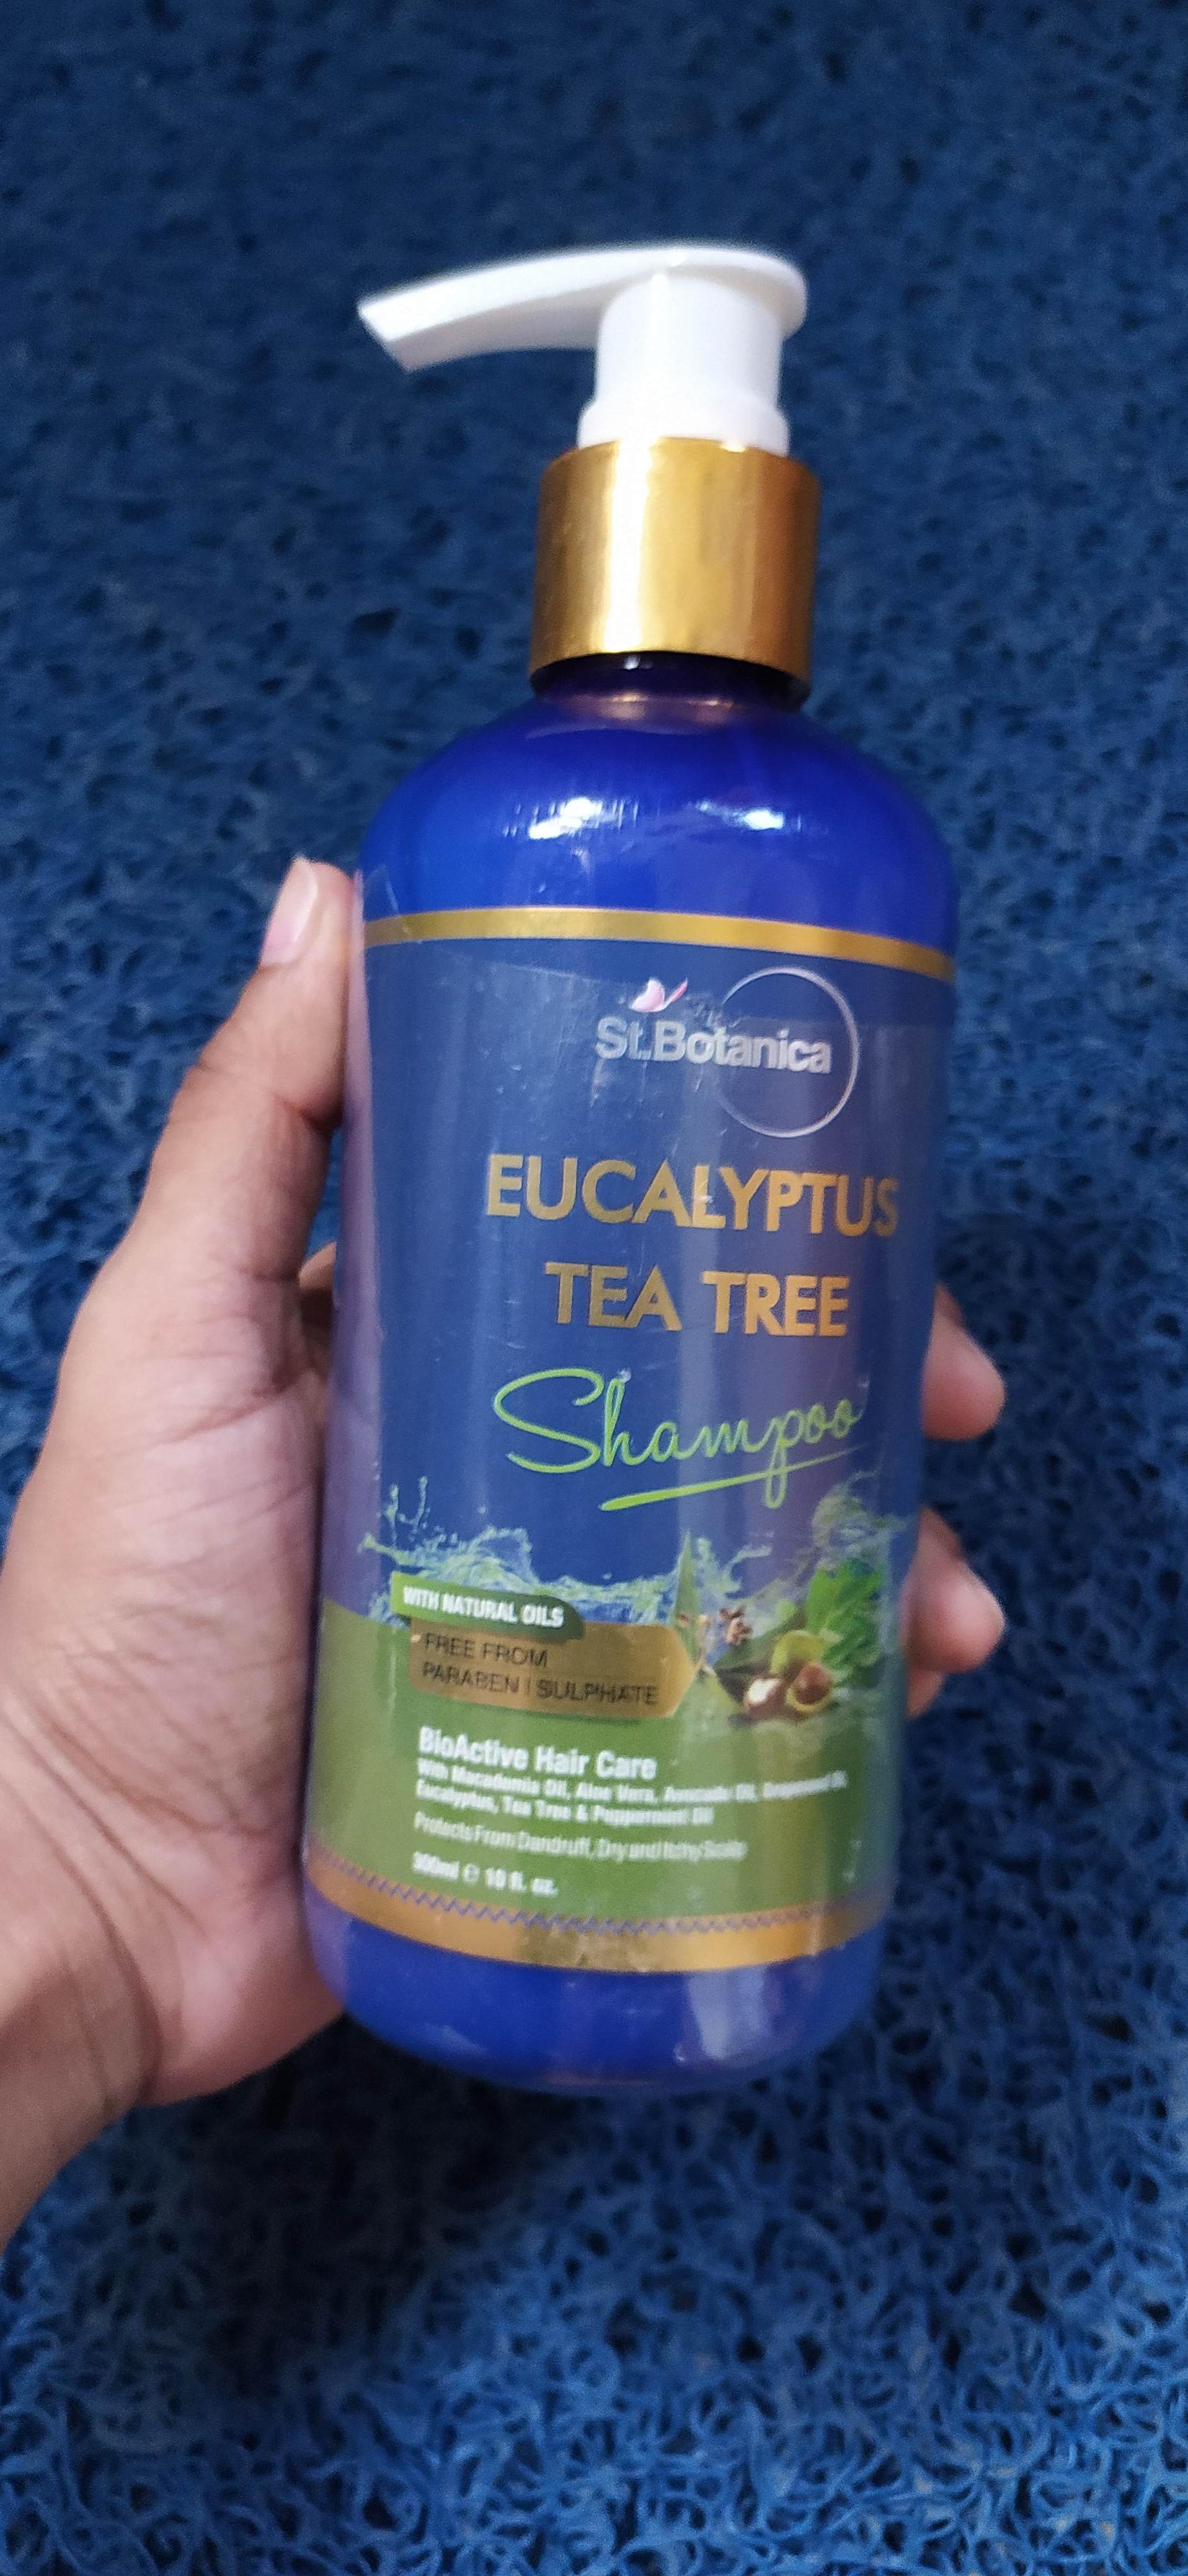 St.Botanica Eucalyptus & Tea Tree Dry Hair Repair Shampoo-Nice product-By gaurkanika